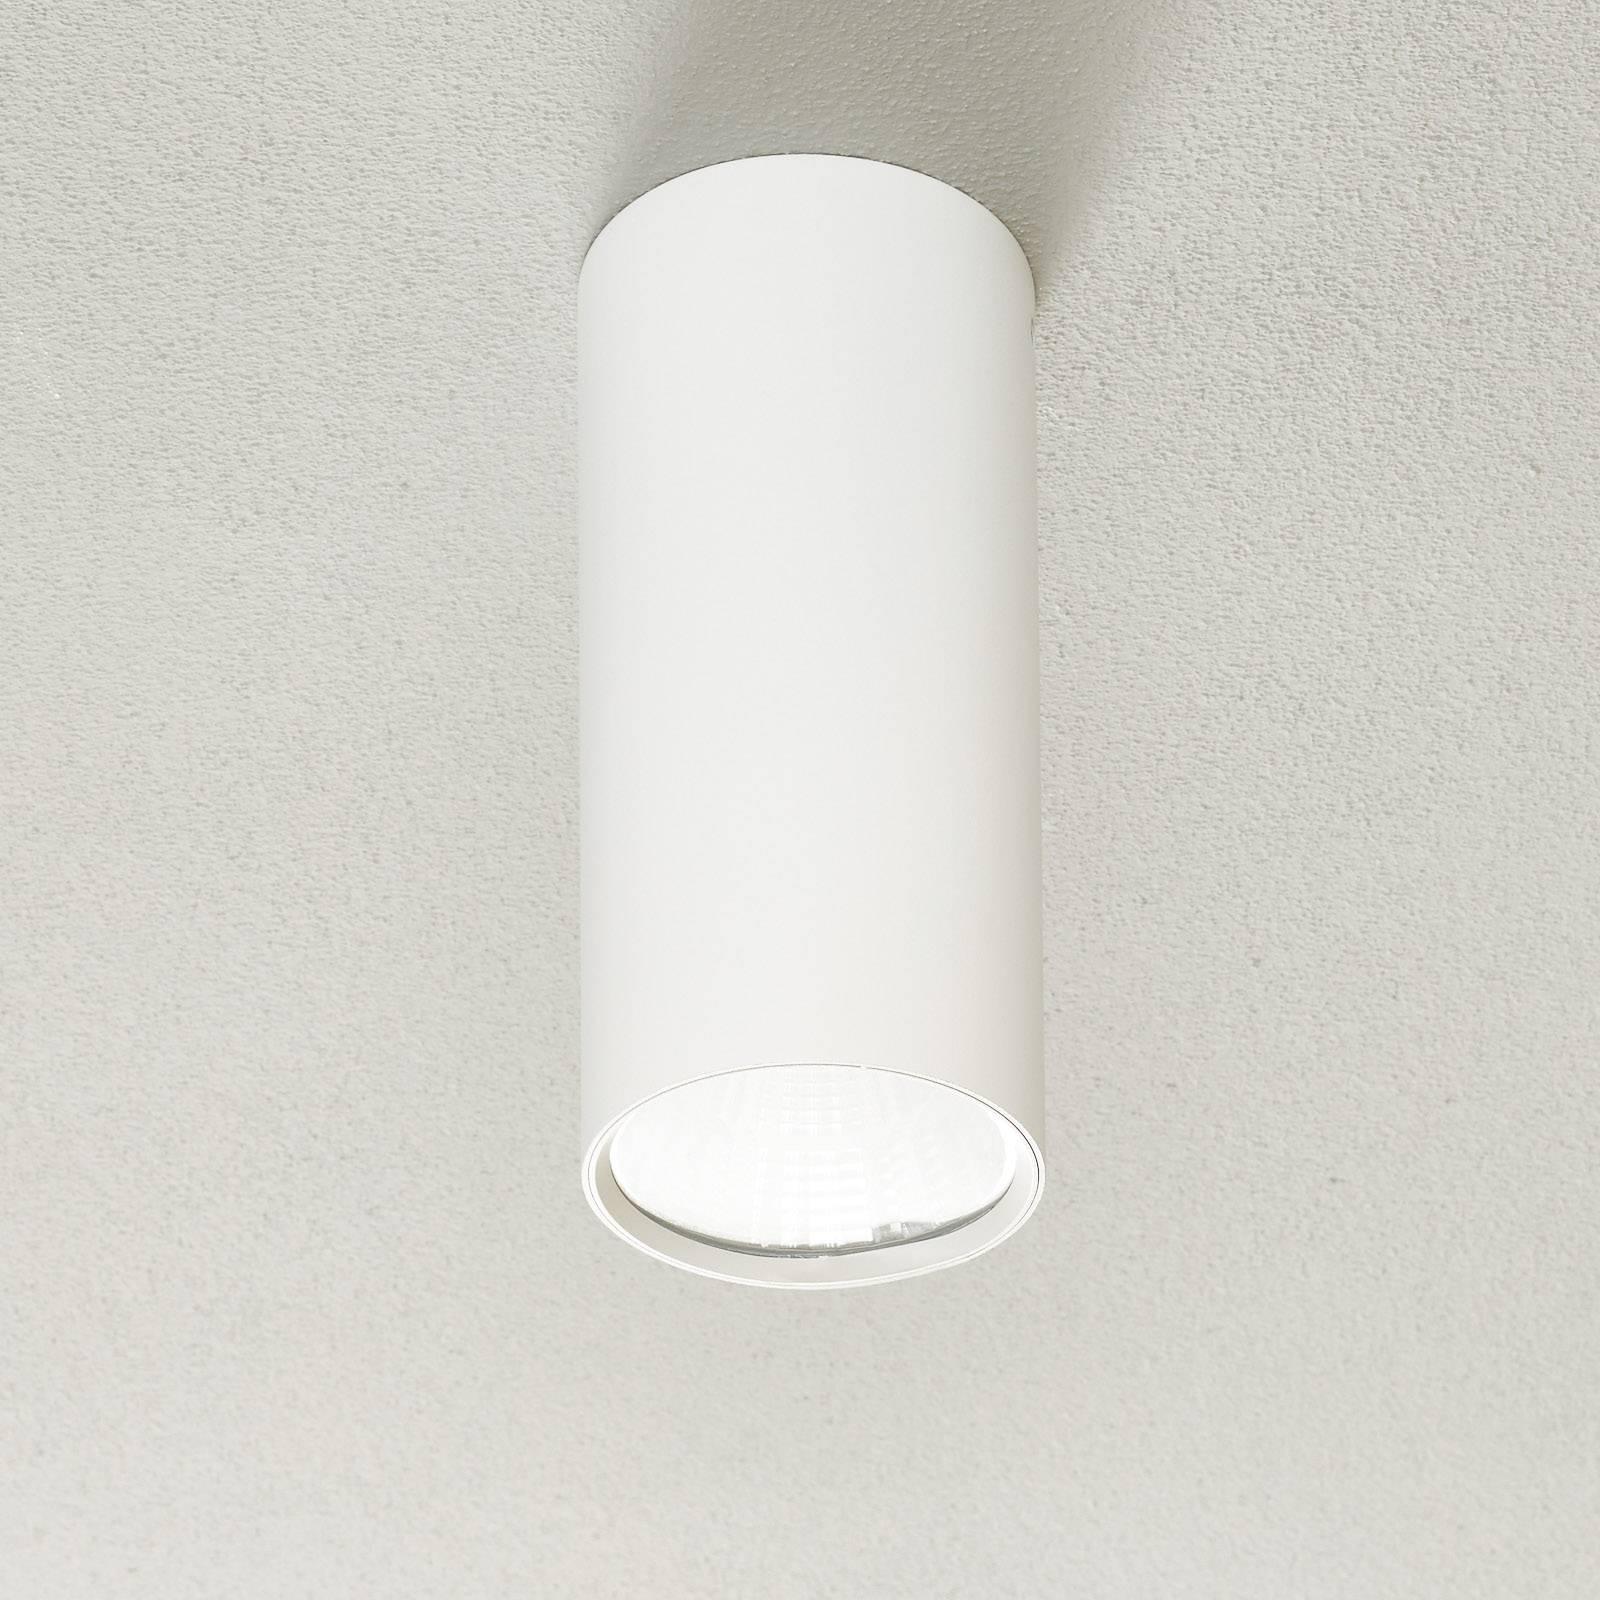 Lucande Takio downlight LED 2700K Ø10cm blanc